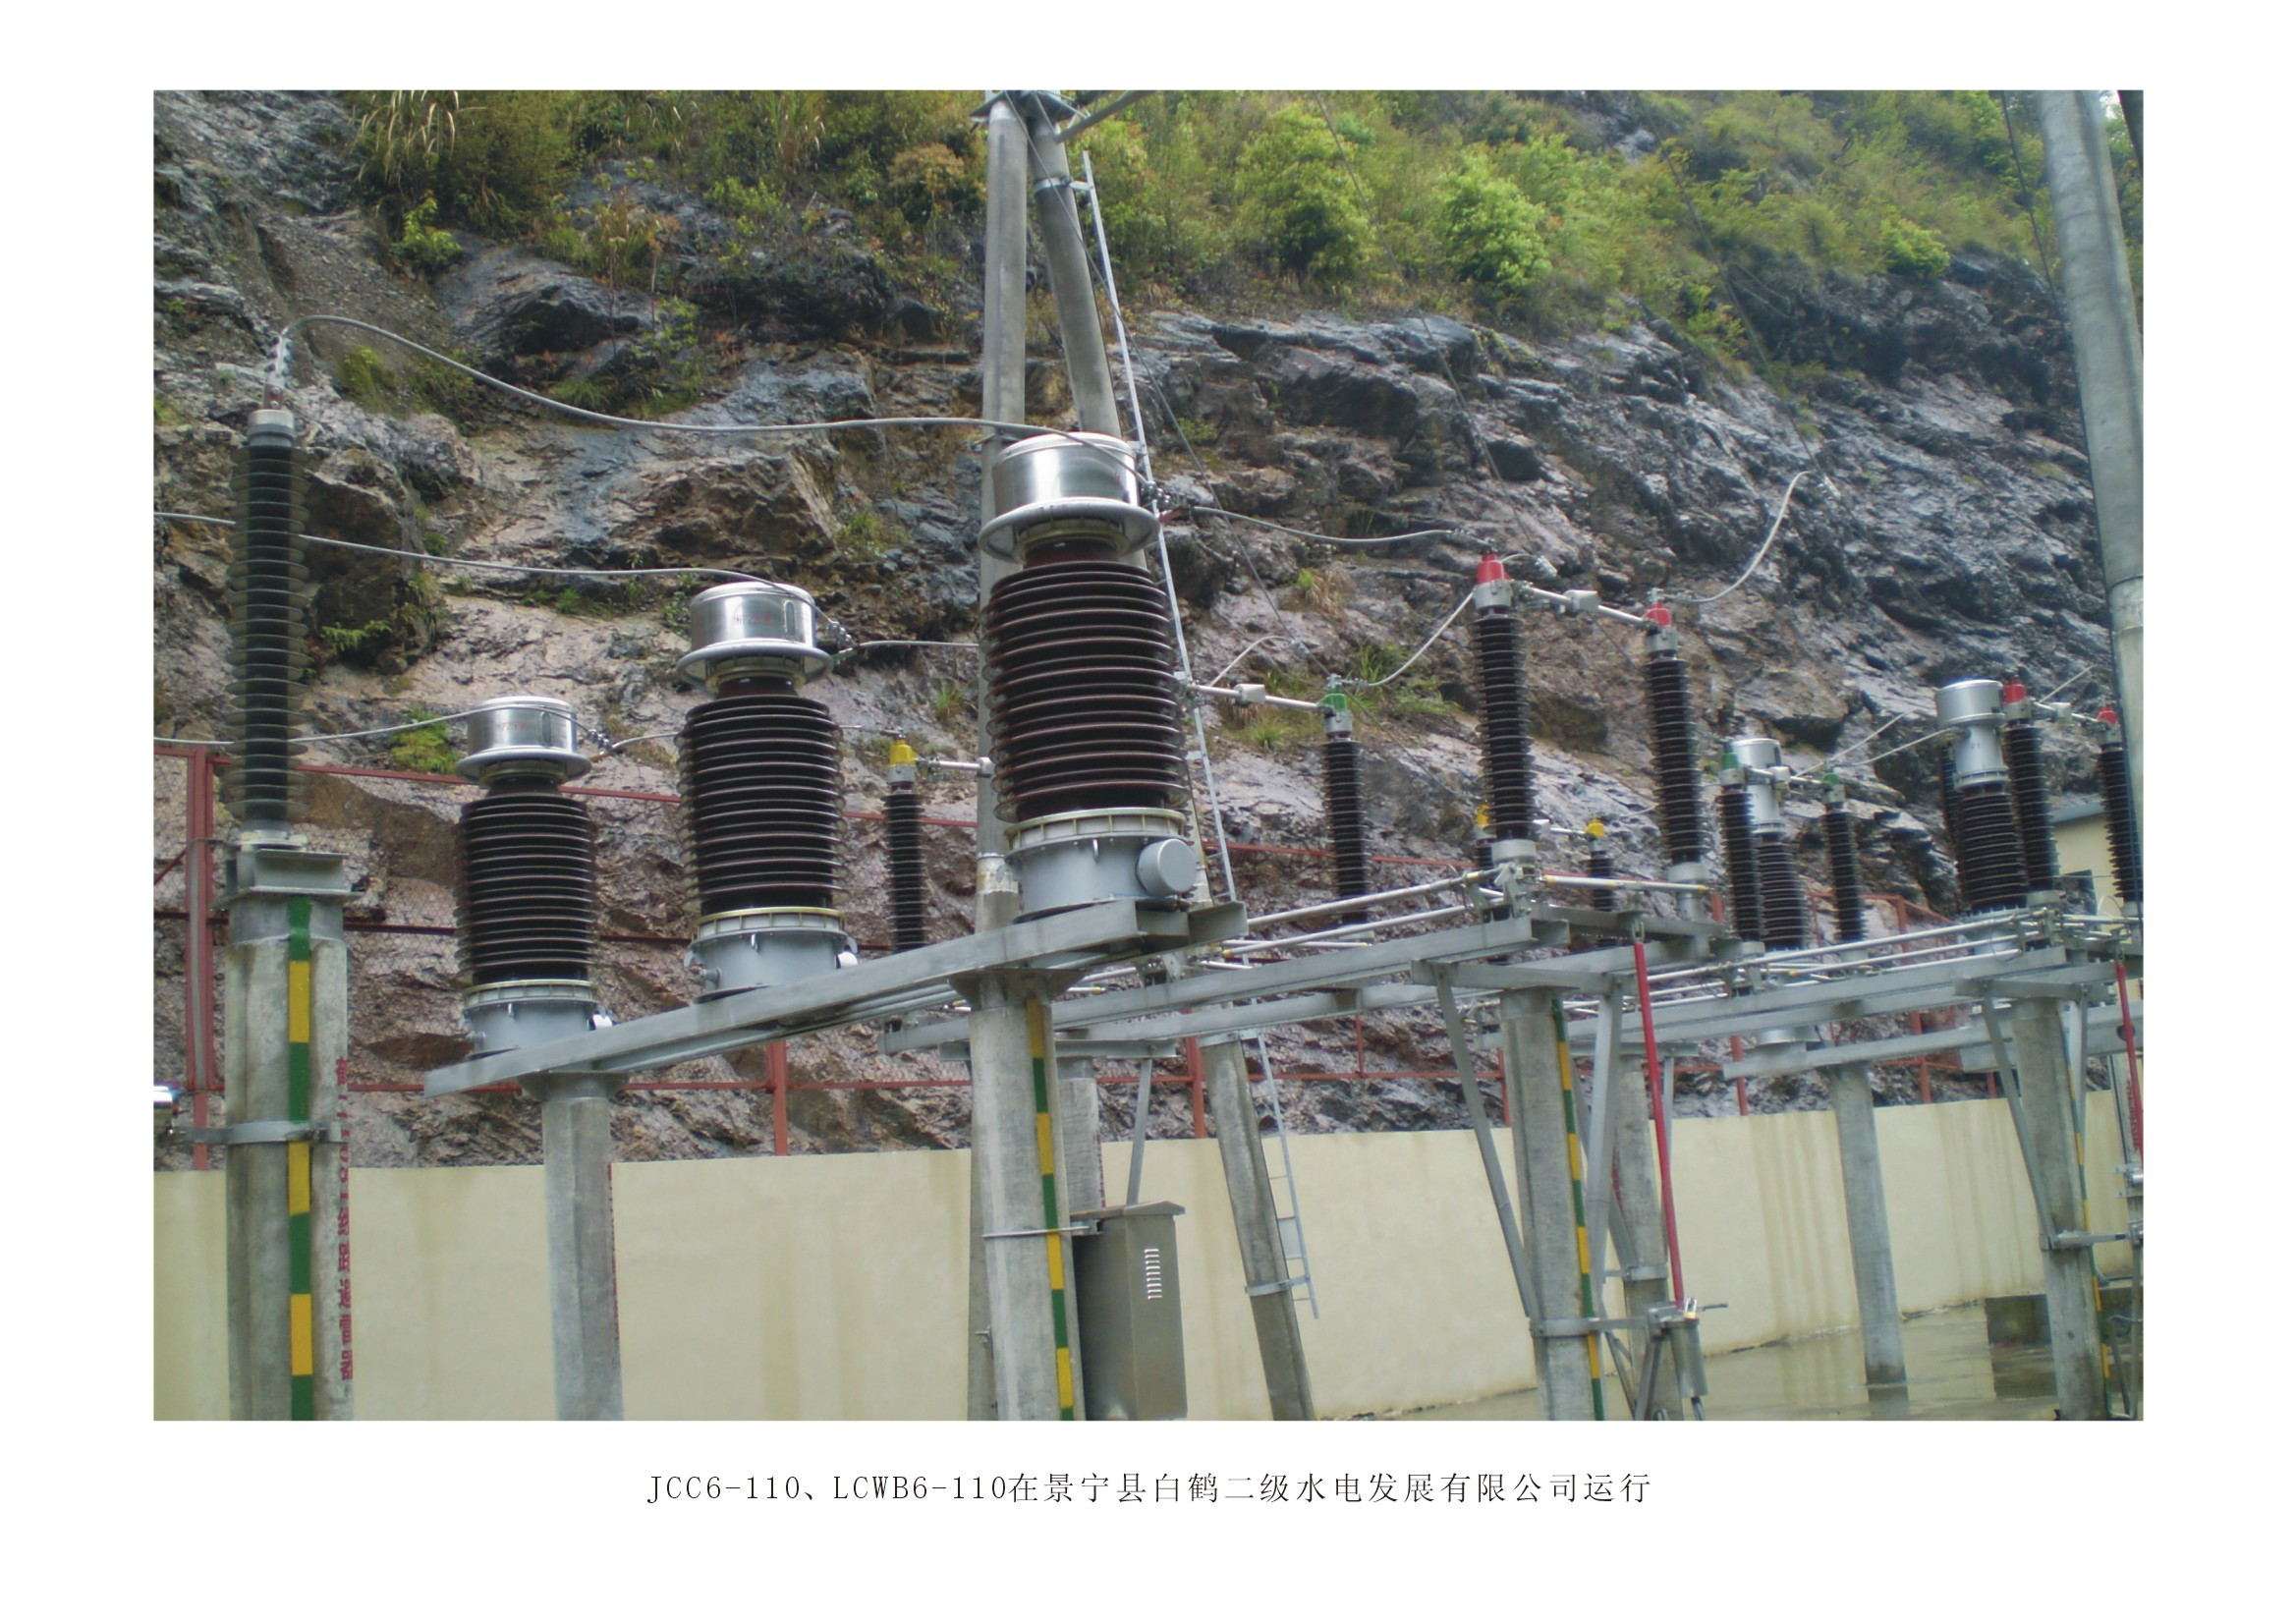 59JCC6-110、LCWB6-110在景宁县白鹤二级水电发展有限公司运行